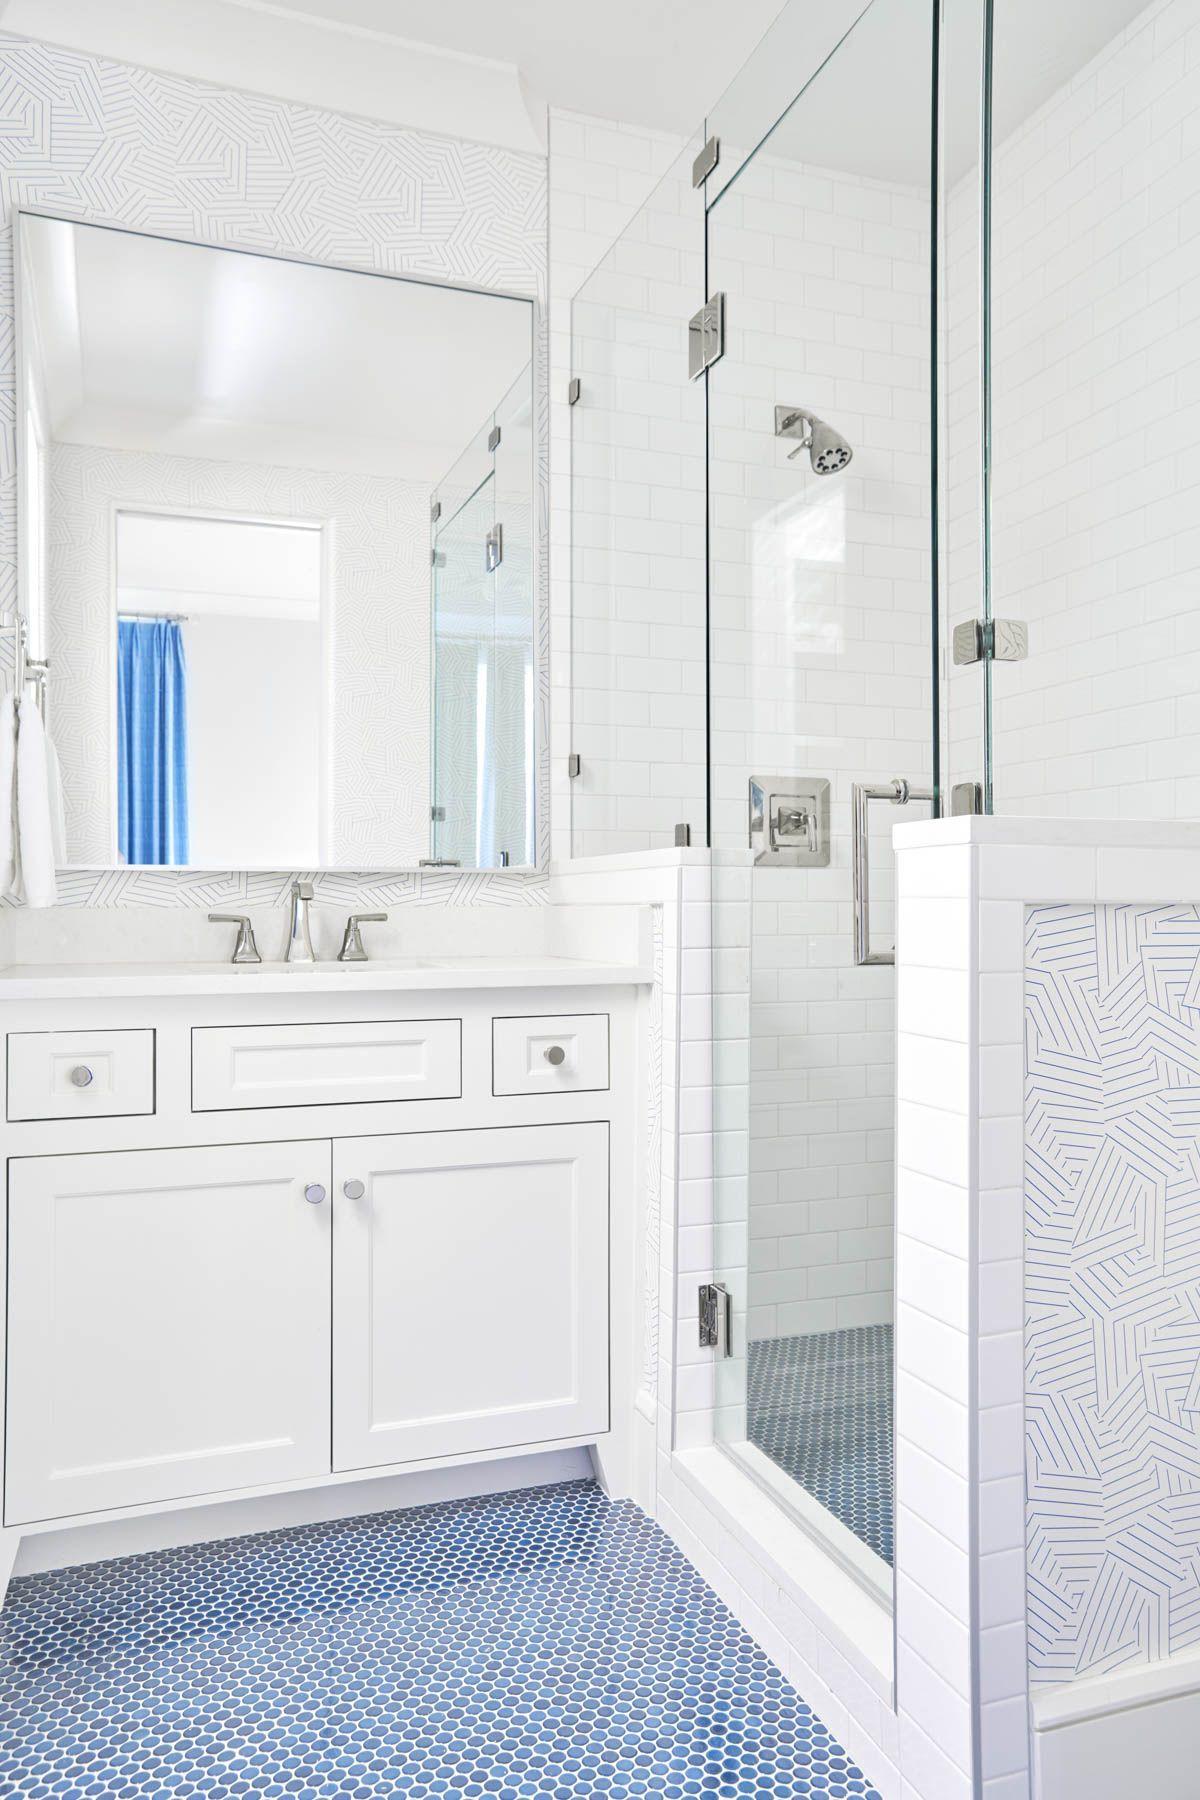 20 Kids Bathrooms Even Adults Would Adore Penny Tiles Bathroom Blue Tile Floor Bathrooms Remodel